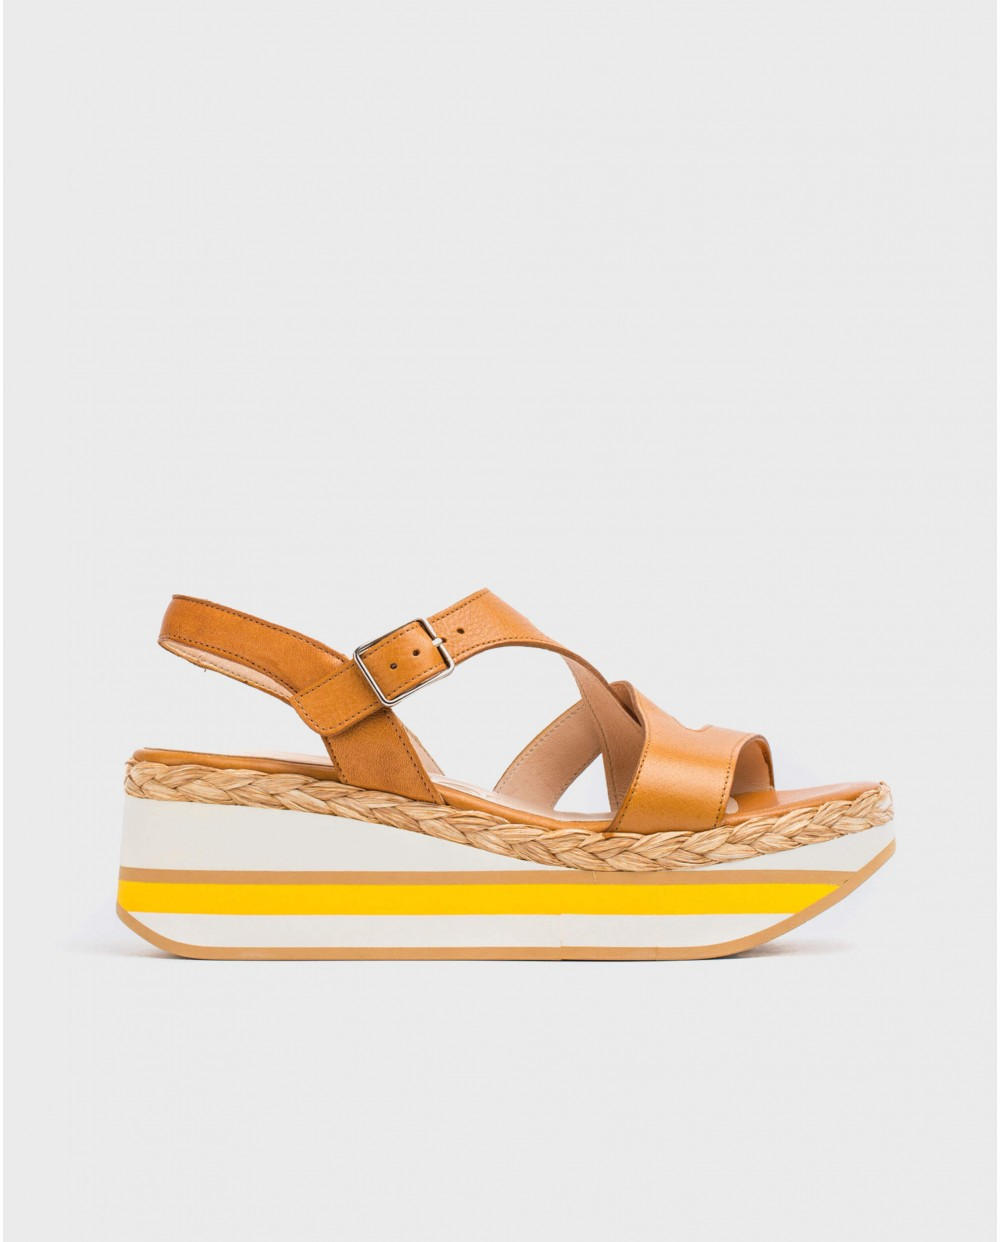 Wonders-Sandals-Leather platform sandal with straps